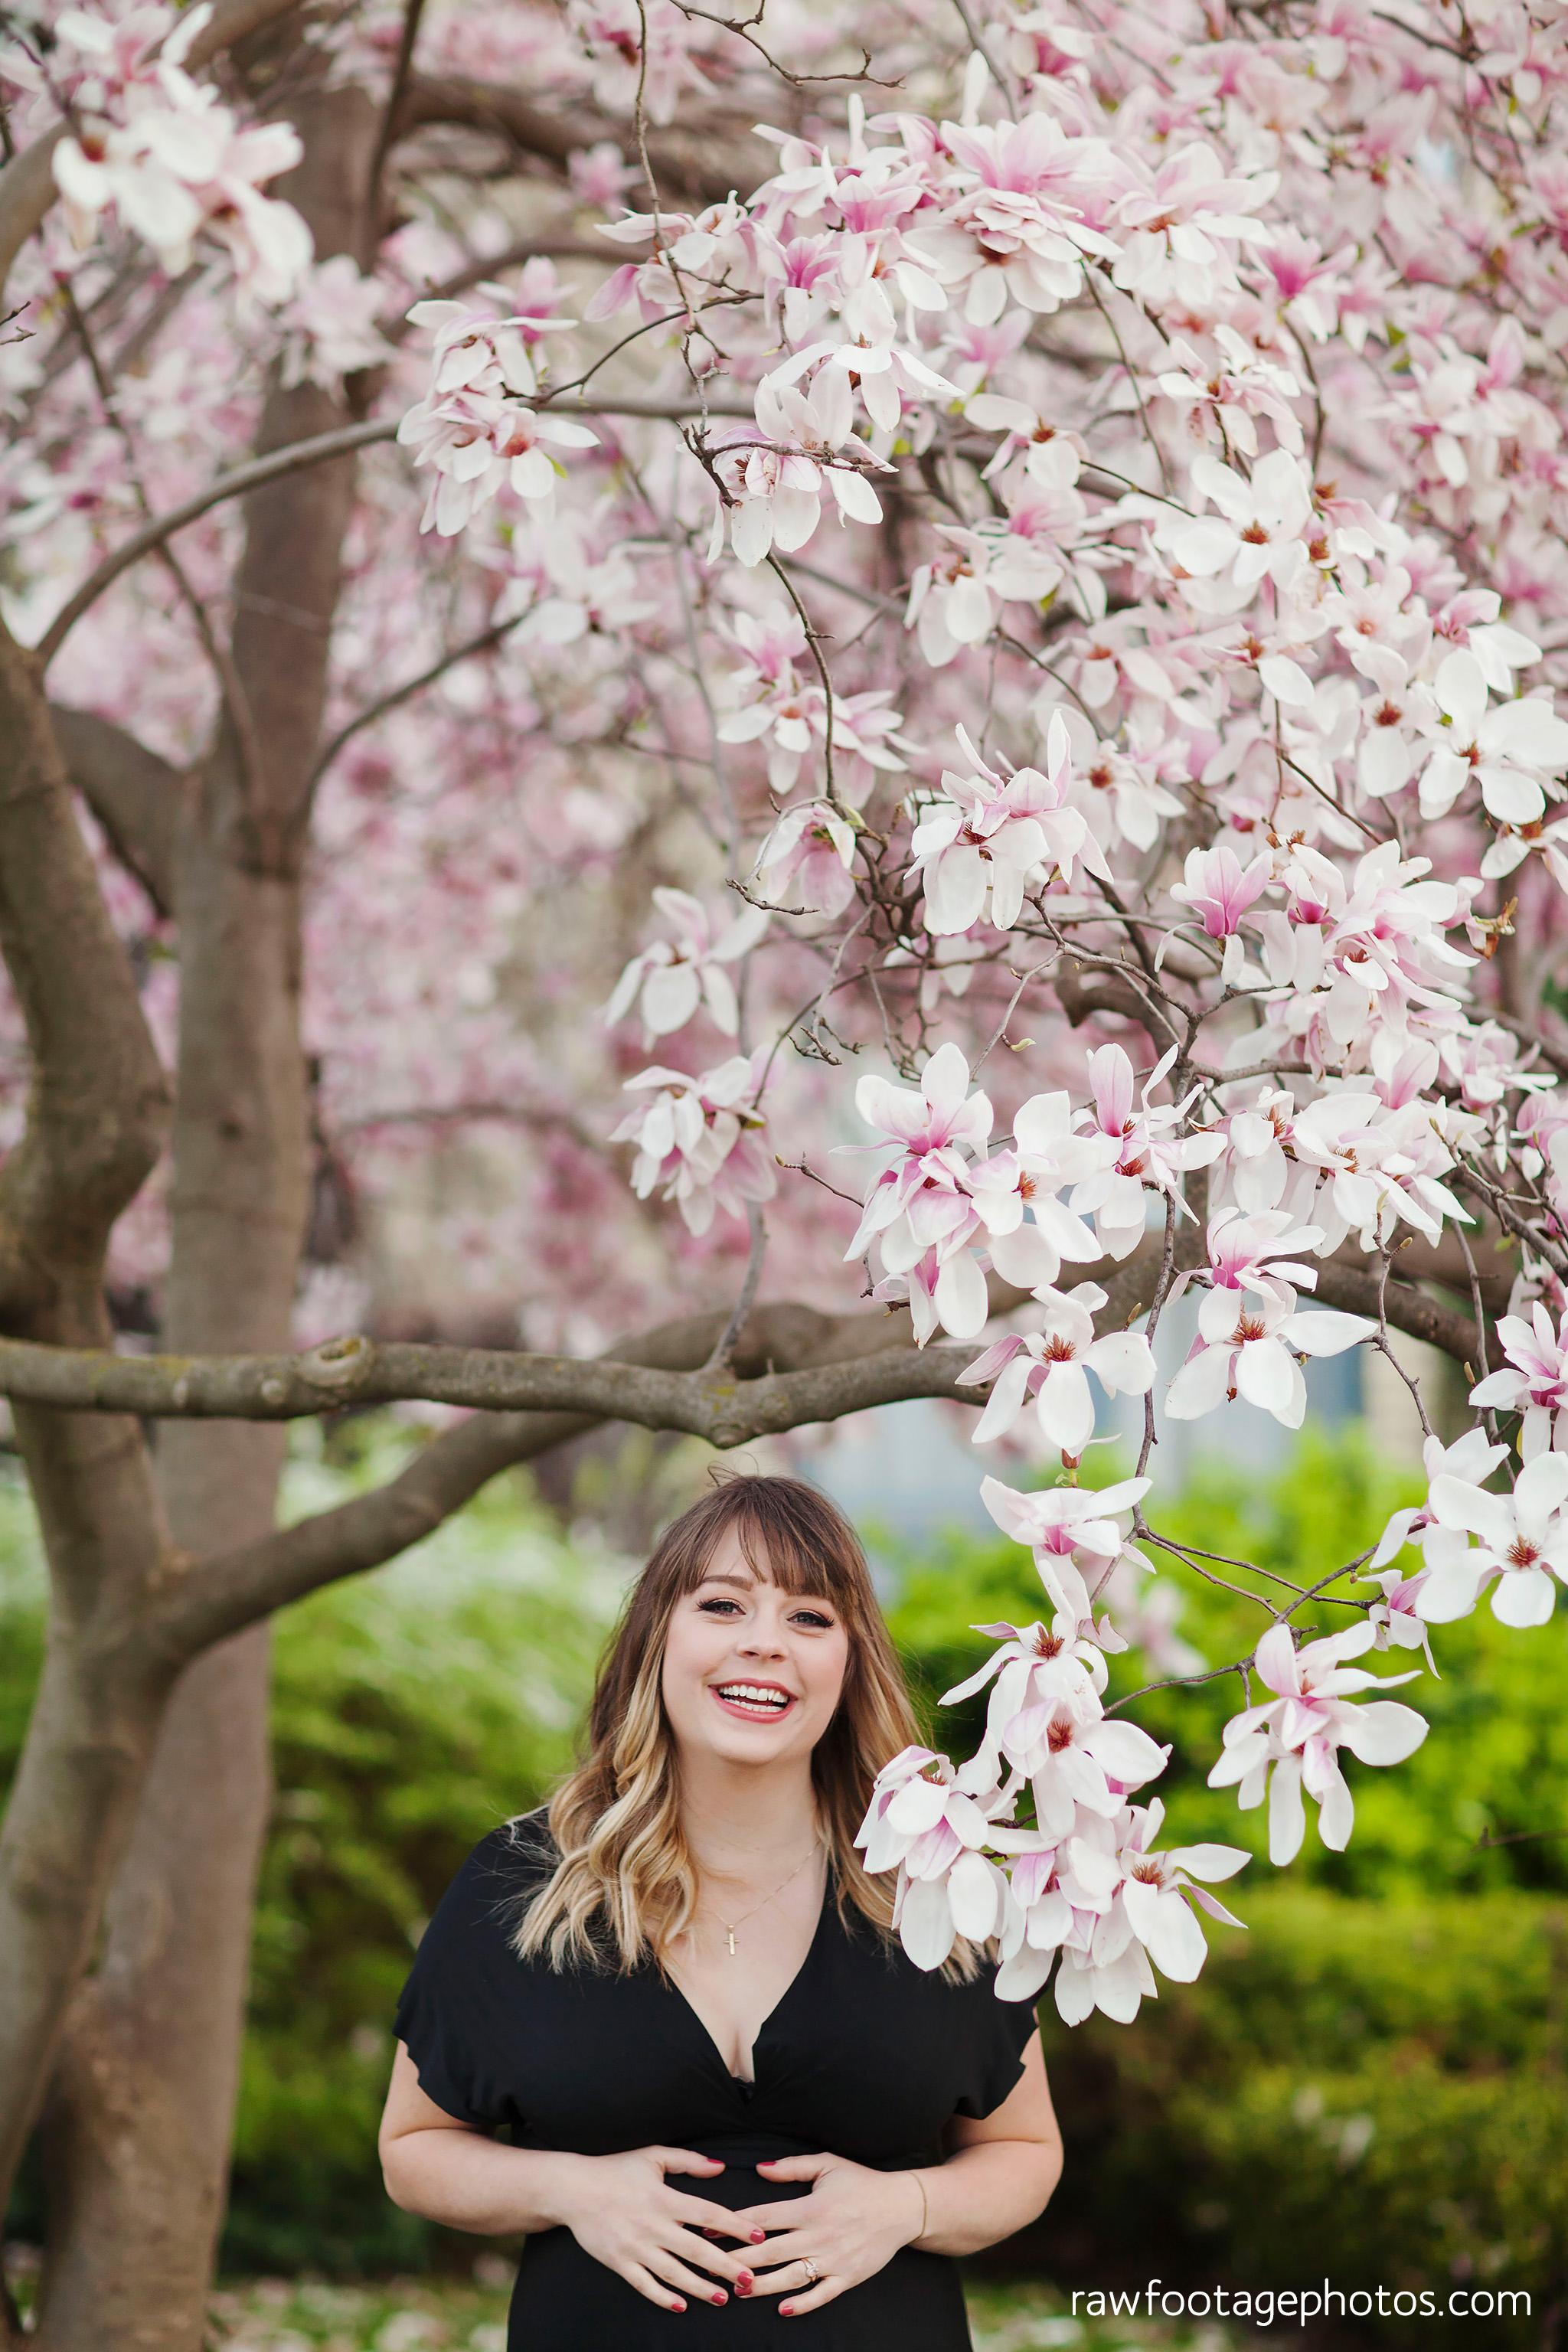 london_ontario_photographer-maternity_session-magnolia_blossoms-magnolia_tree-night_shot-lifestyle_photography-raw_footage_photography001.jpg